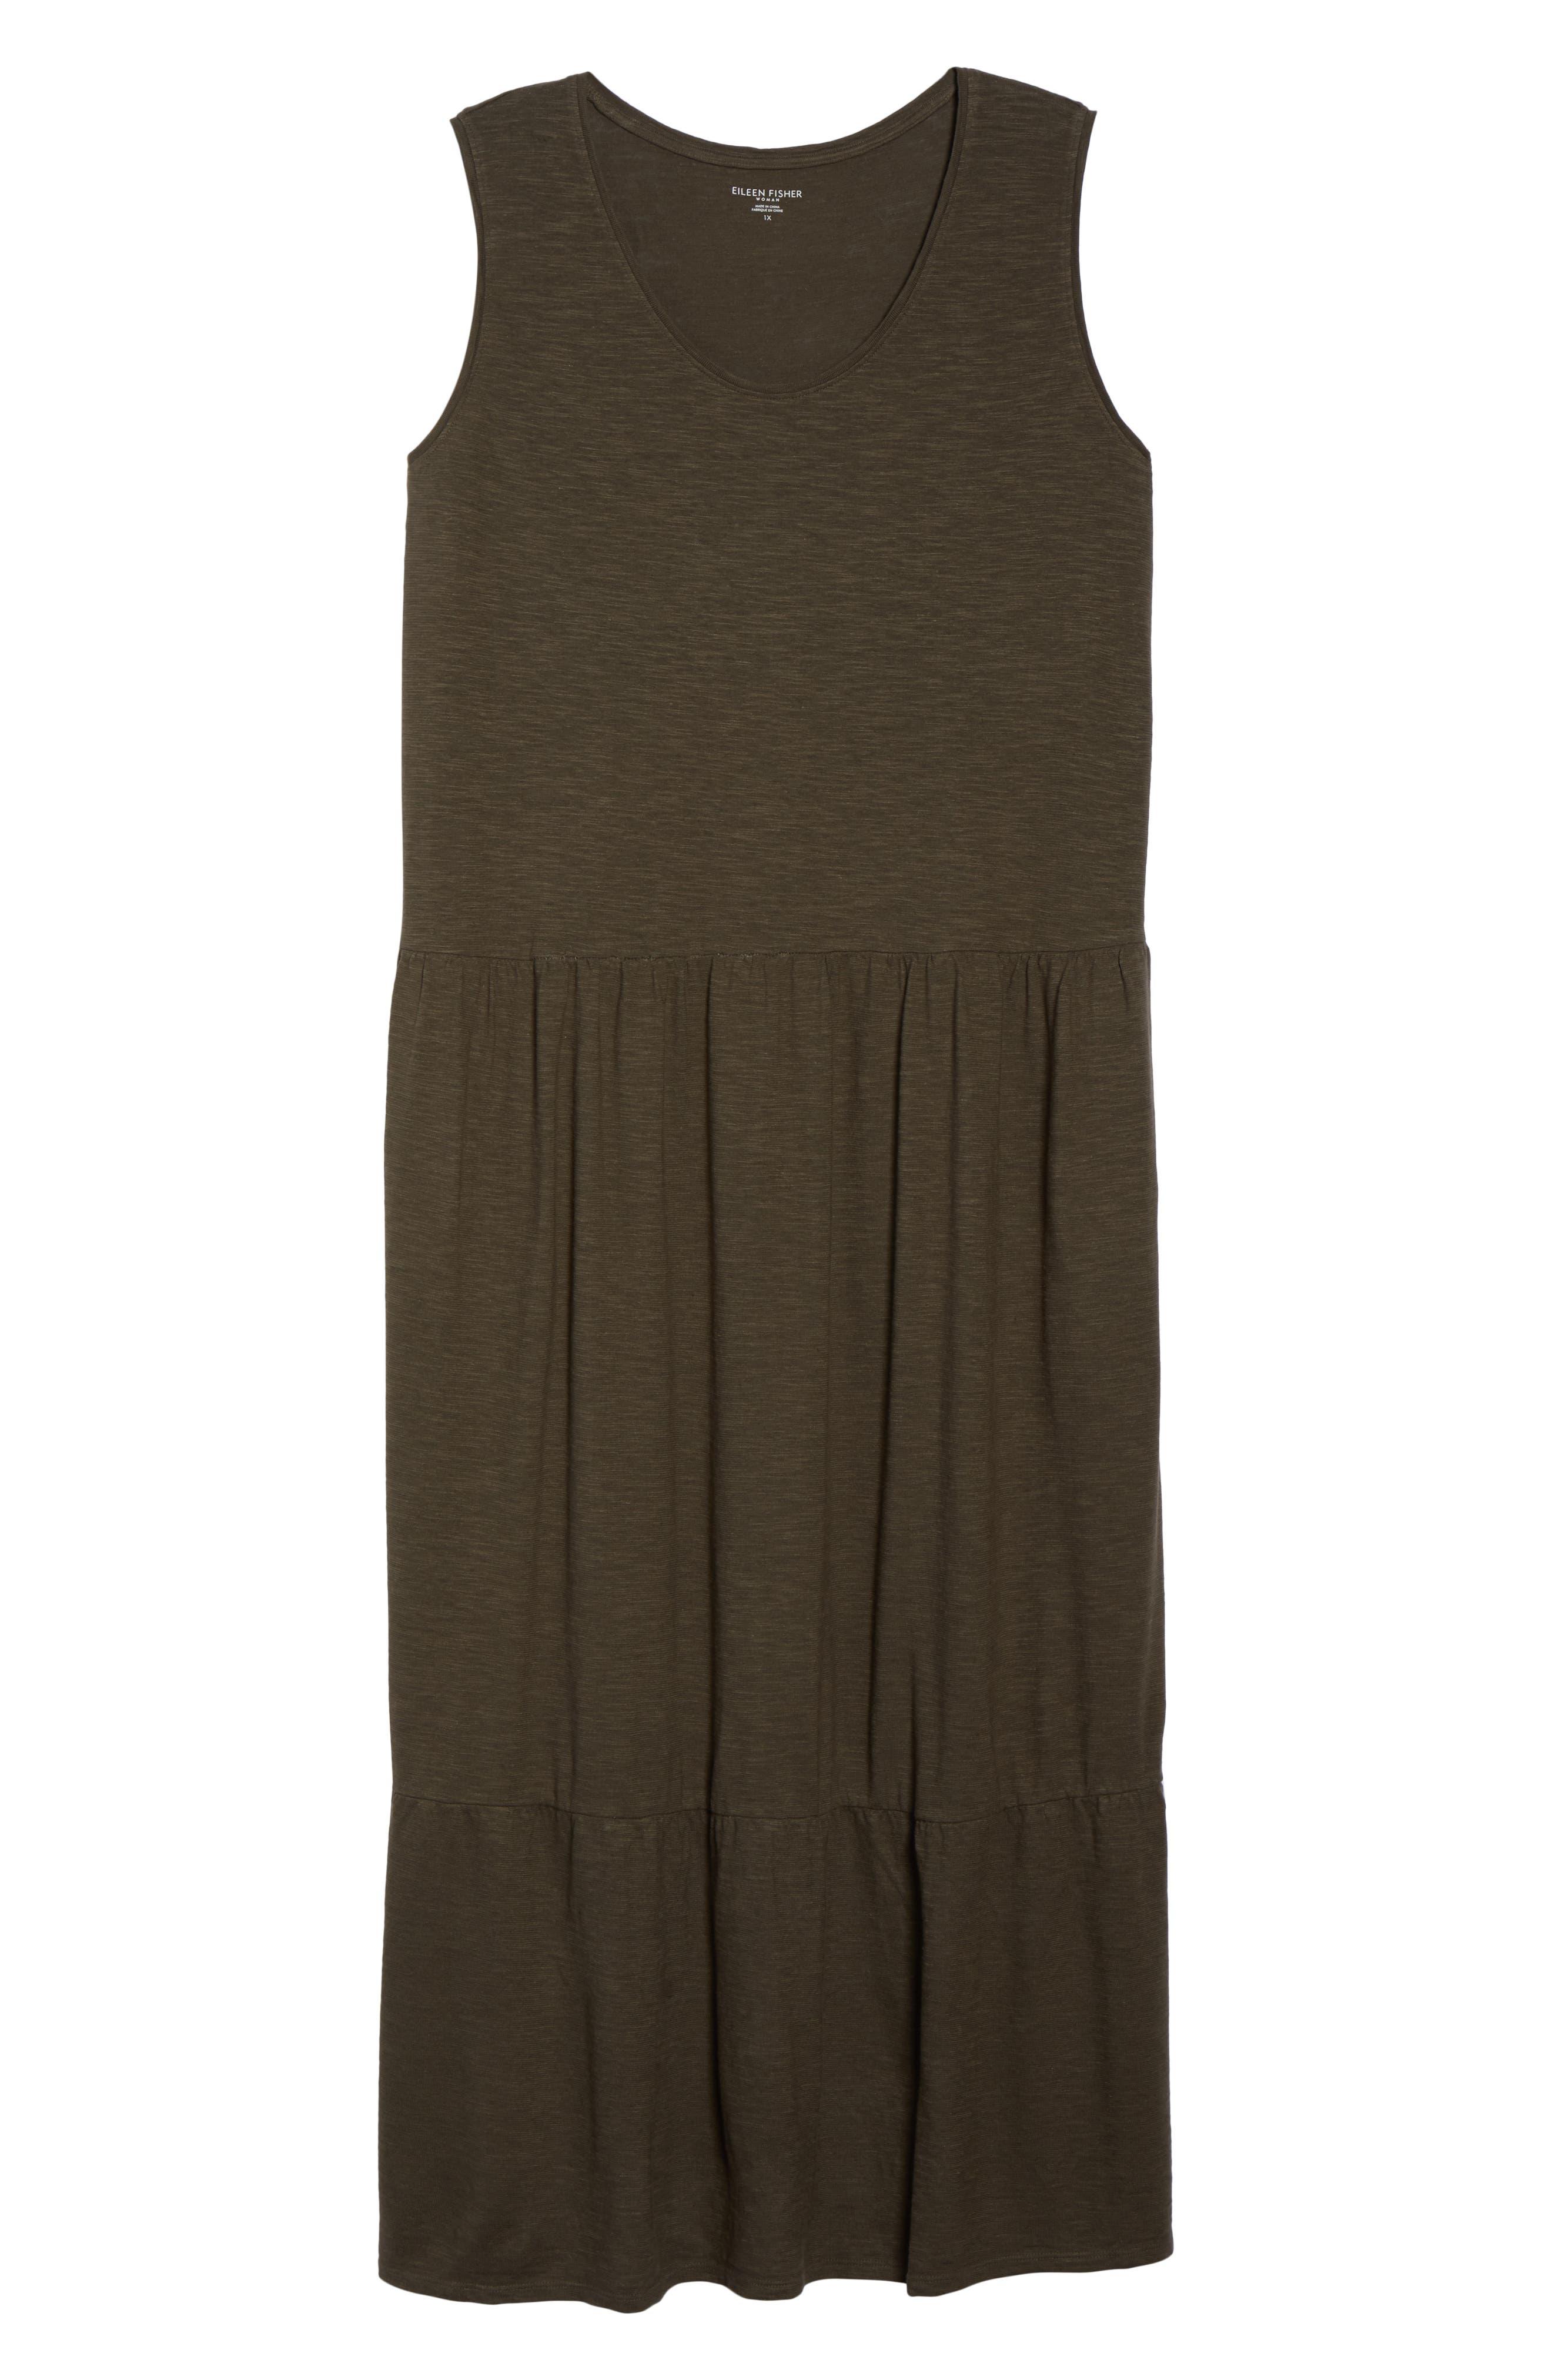 Scooped Neck Hemp & Cotton Midi Dress,                             Alternate thumbnail 7, color,                             359